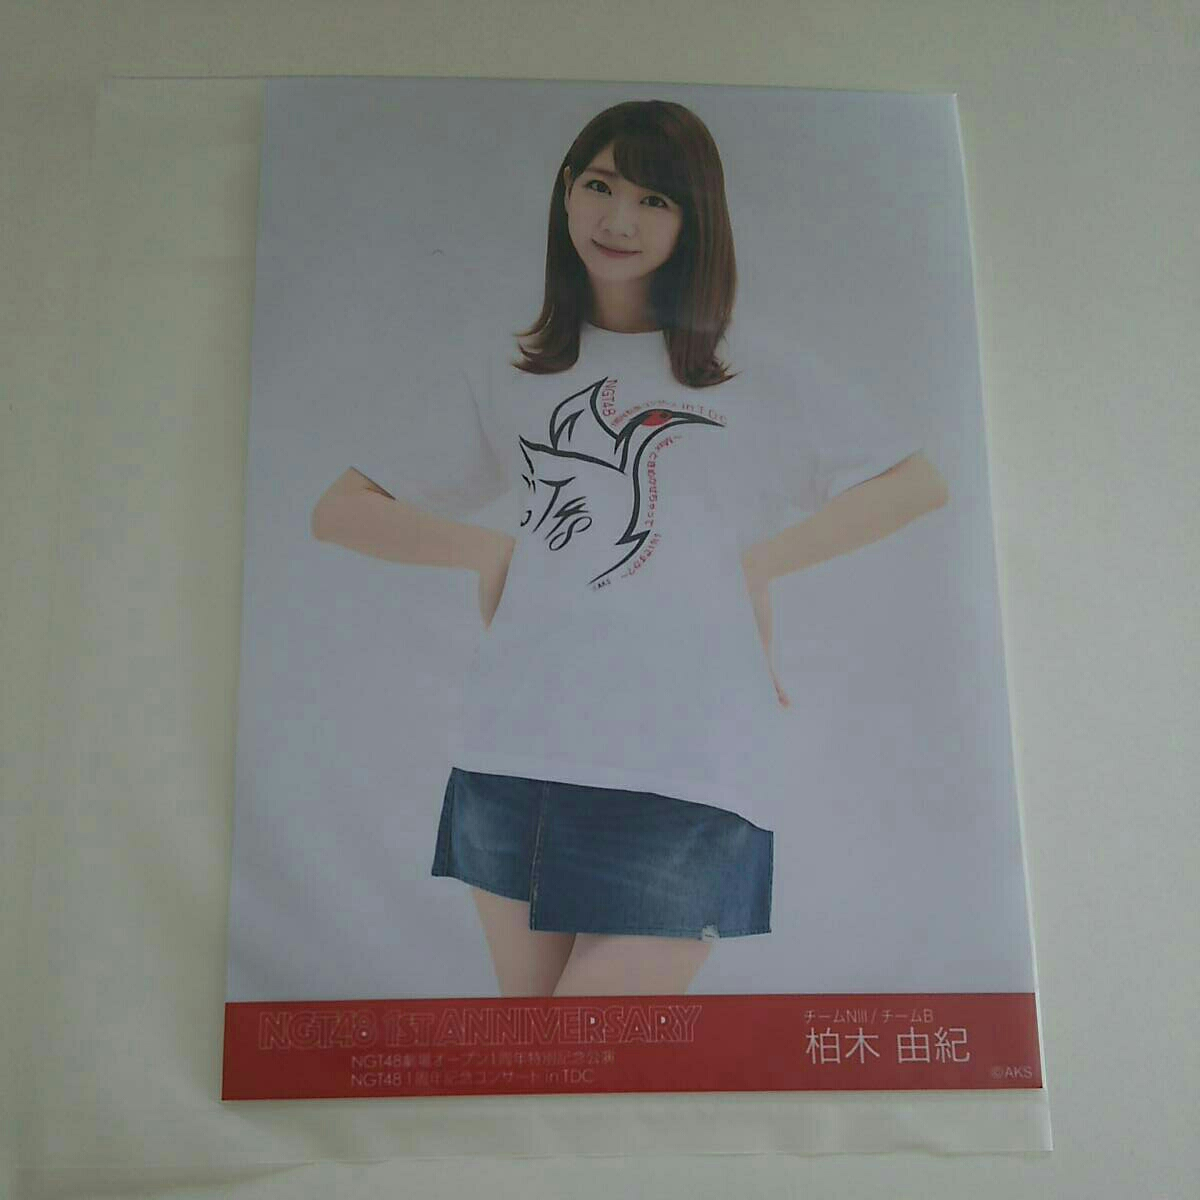 NGT48 柏木由紀 1ST ANNIVERSARY DVD/BD 封入 生写真 ライブグッズの画像